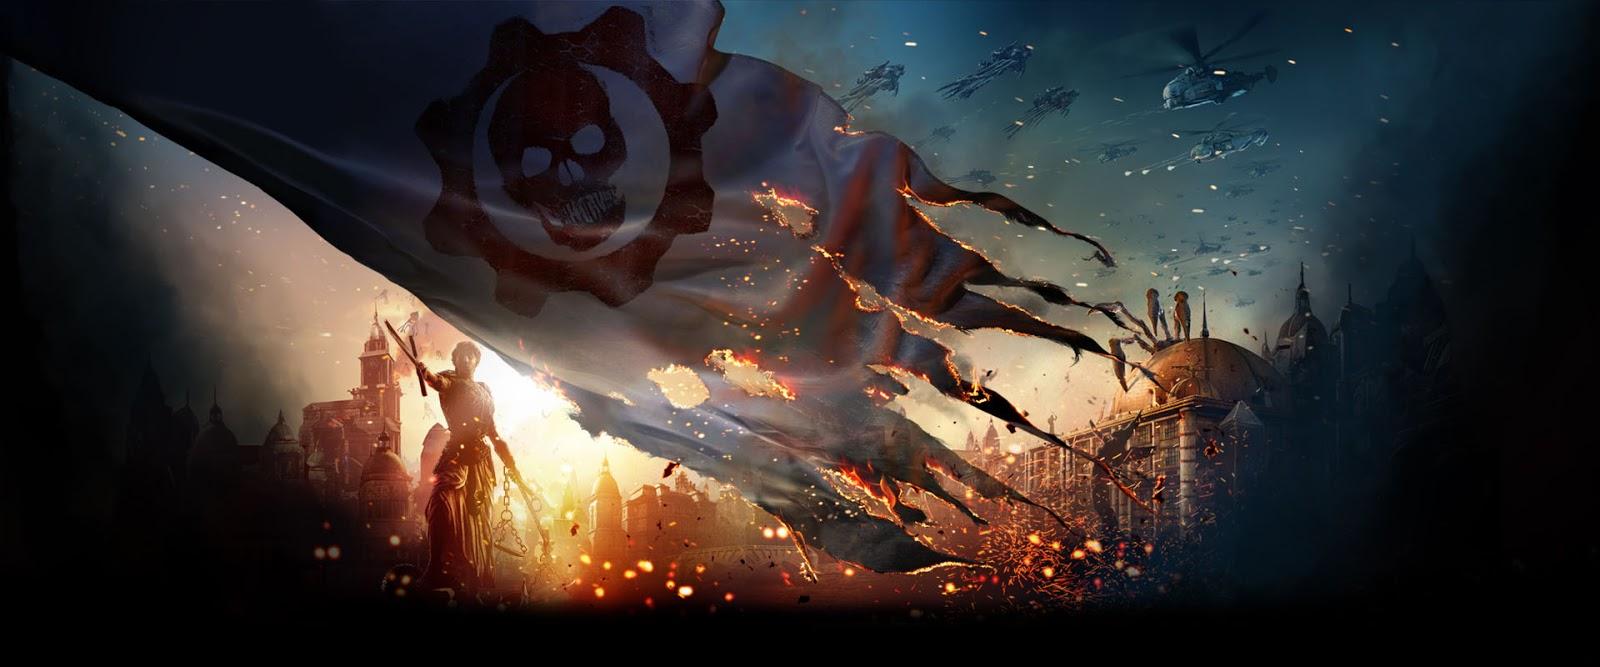 by LEAGUE OF FICTION Gears of War 4 Judgement HD Desktop Wallpaper 1600x667